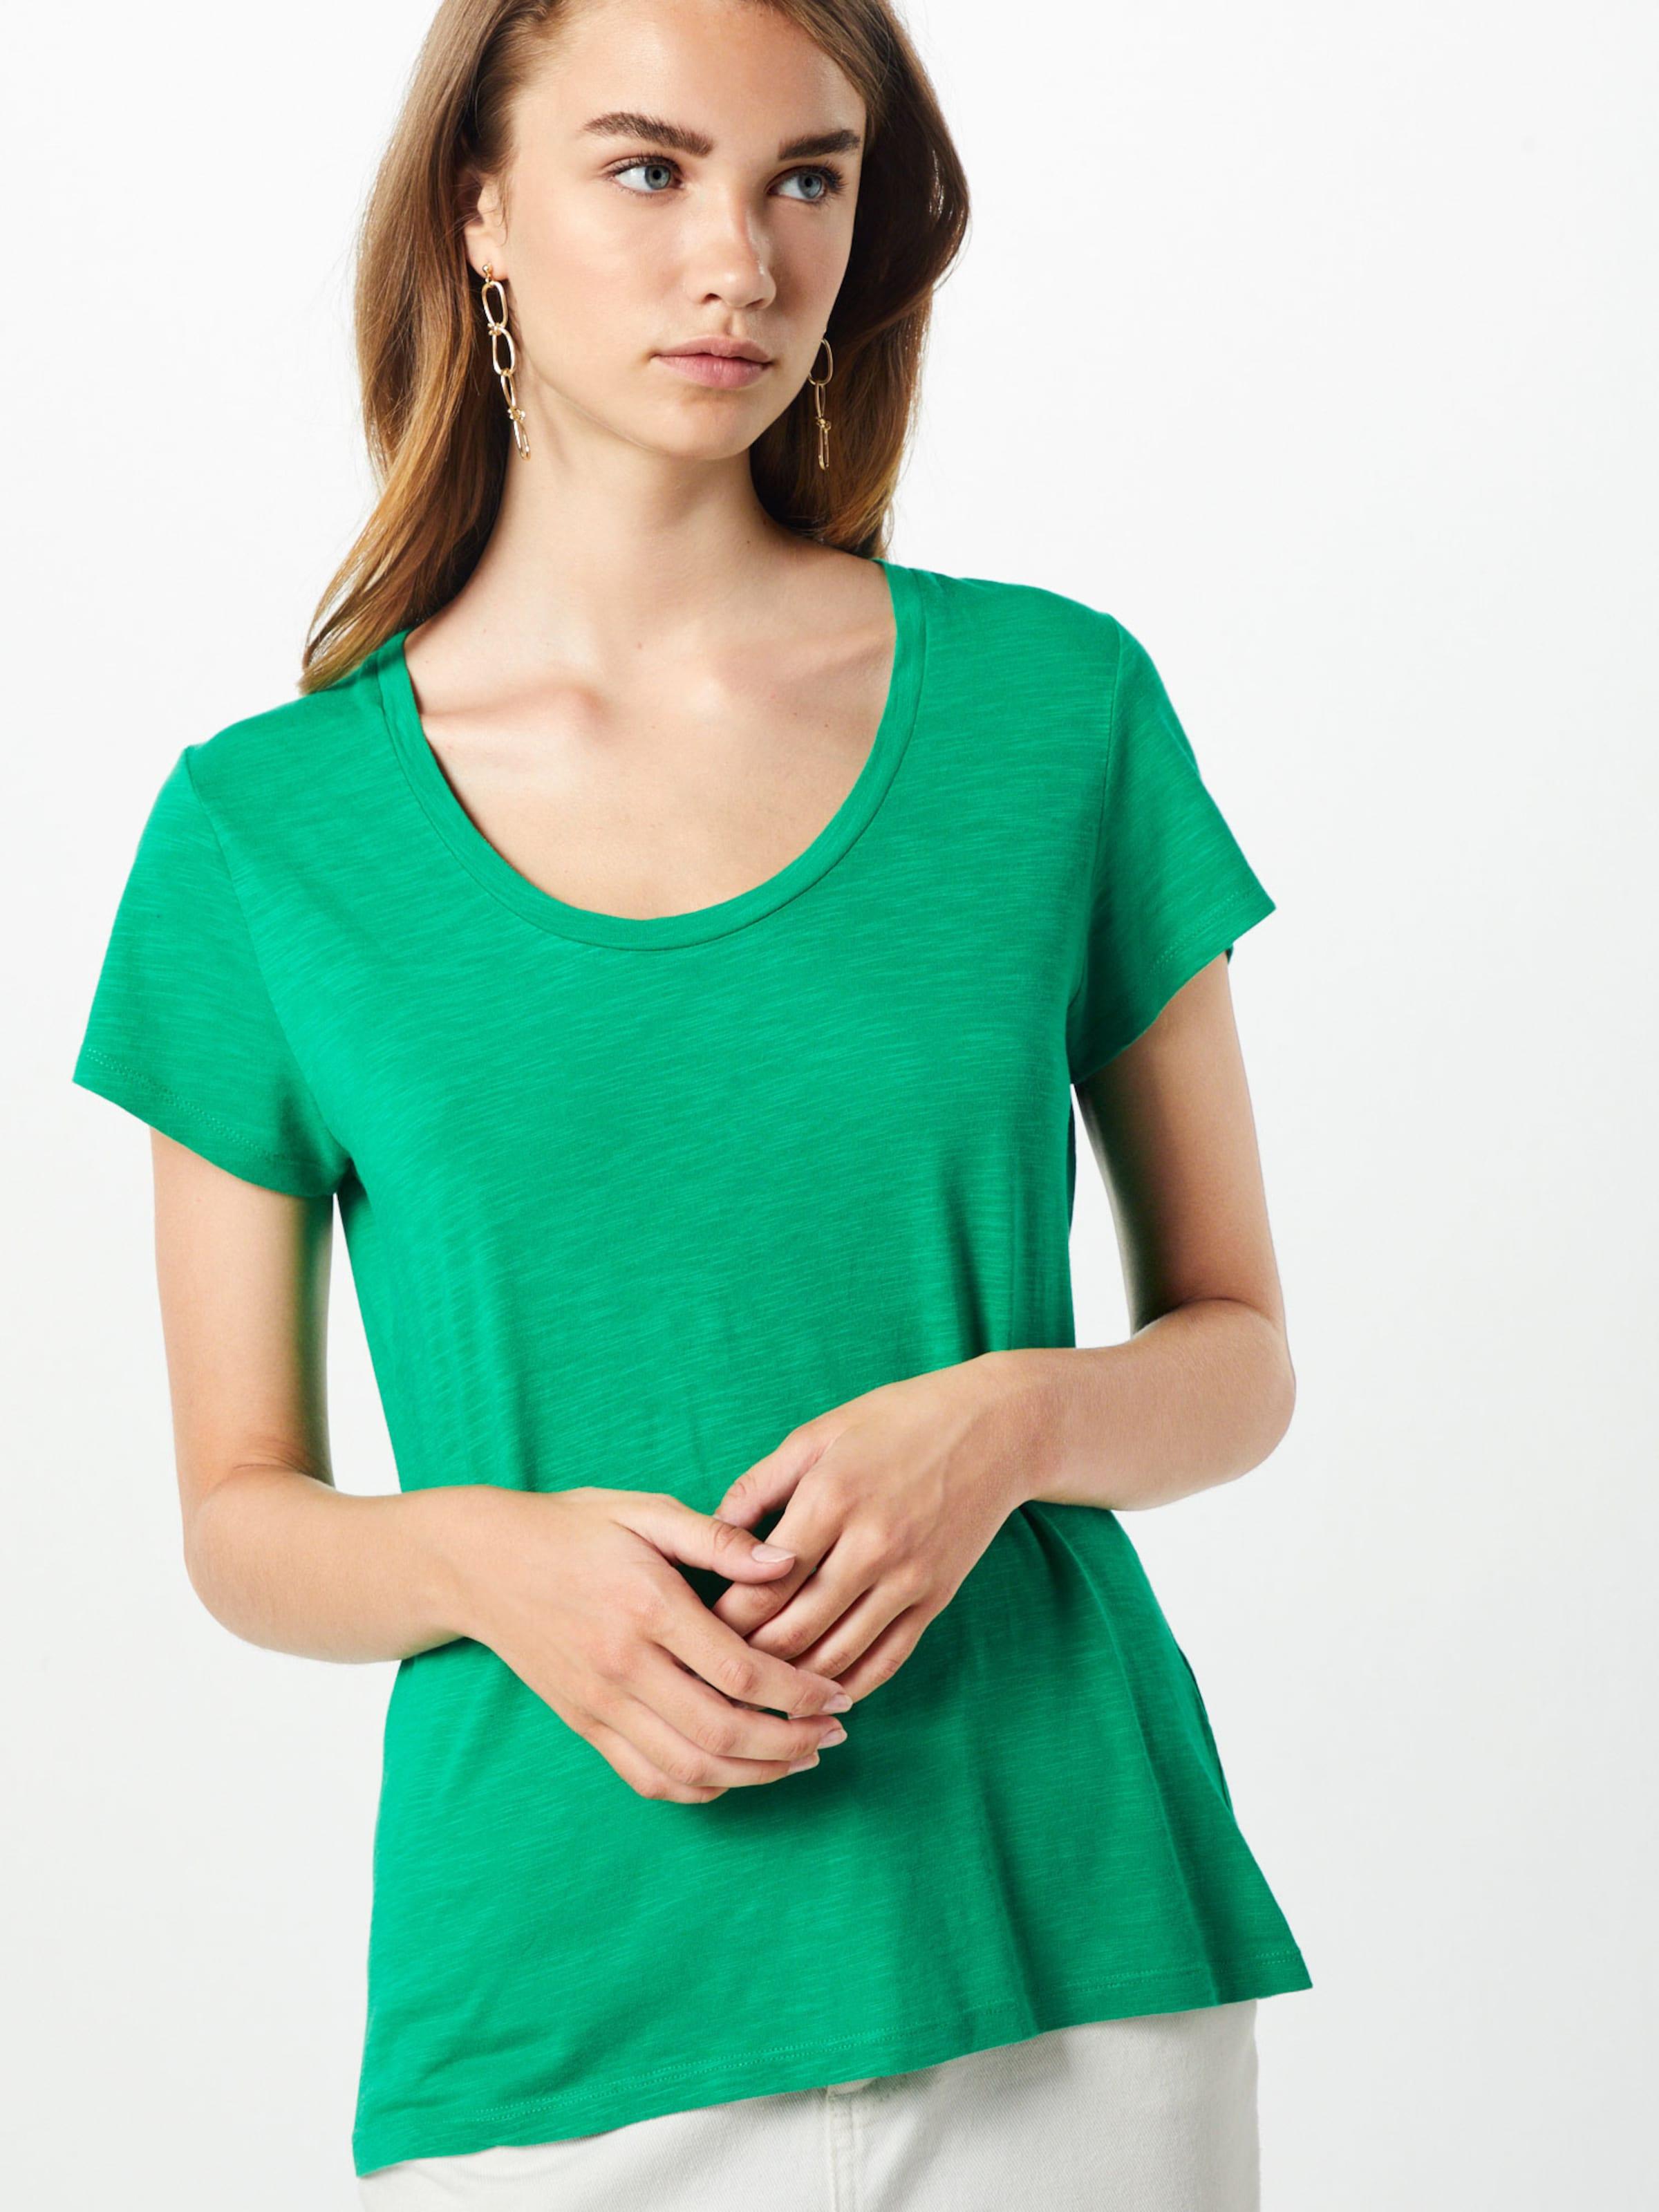 Clair Rouge En American Vintage shirt 'jac48h19' T 0w8OkXnP